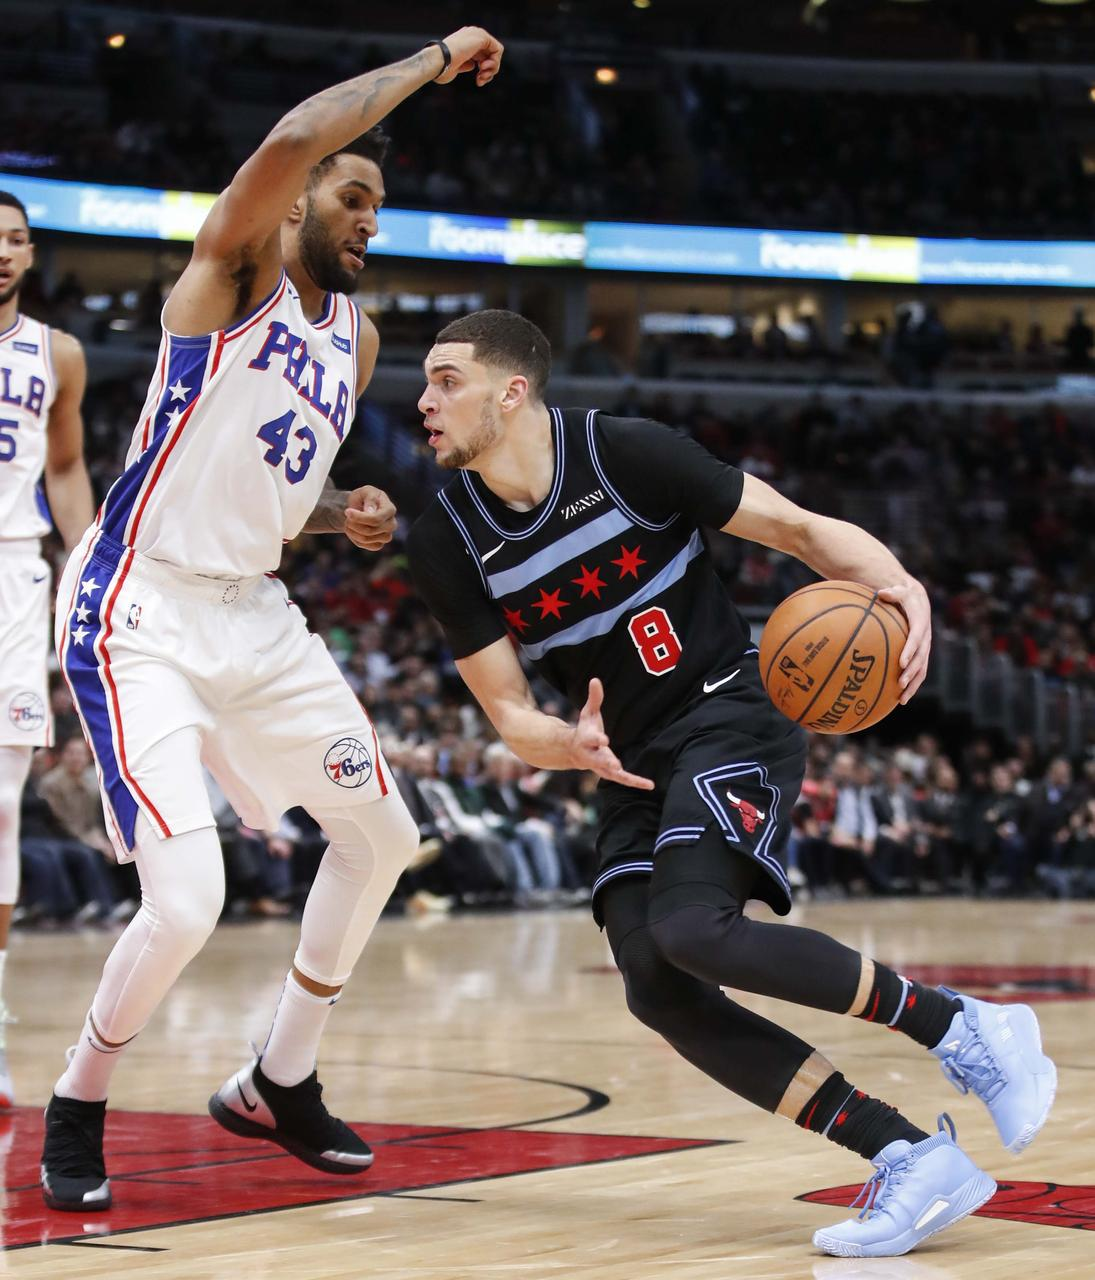 LaVine scores 39, carries Bulls over 76ers - Reuters